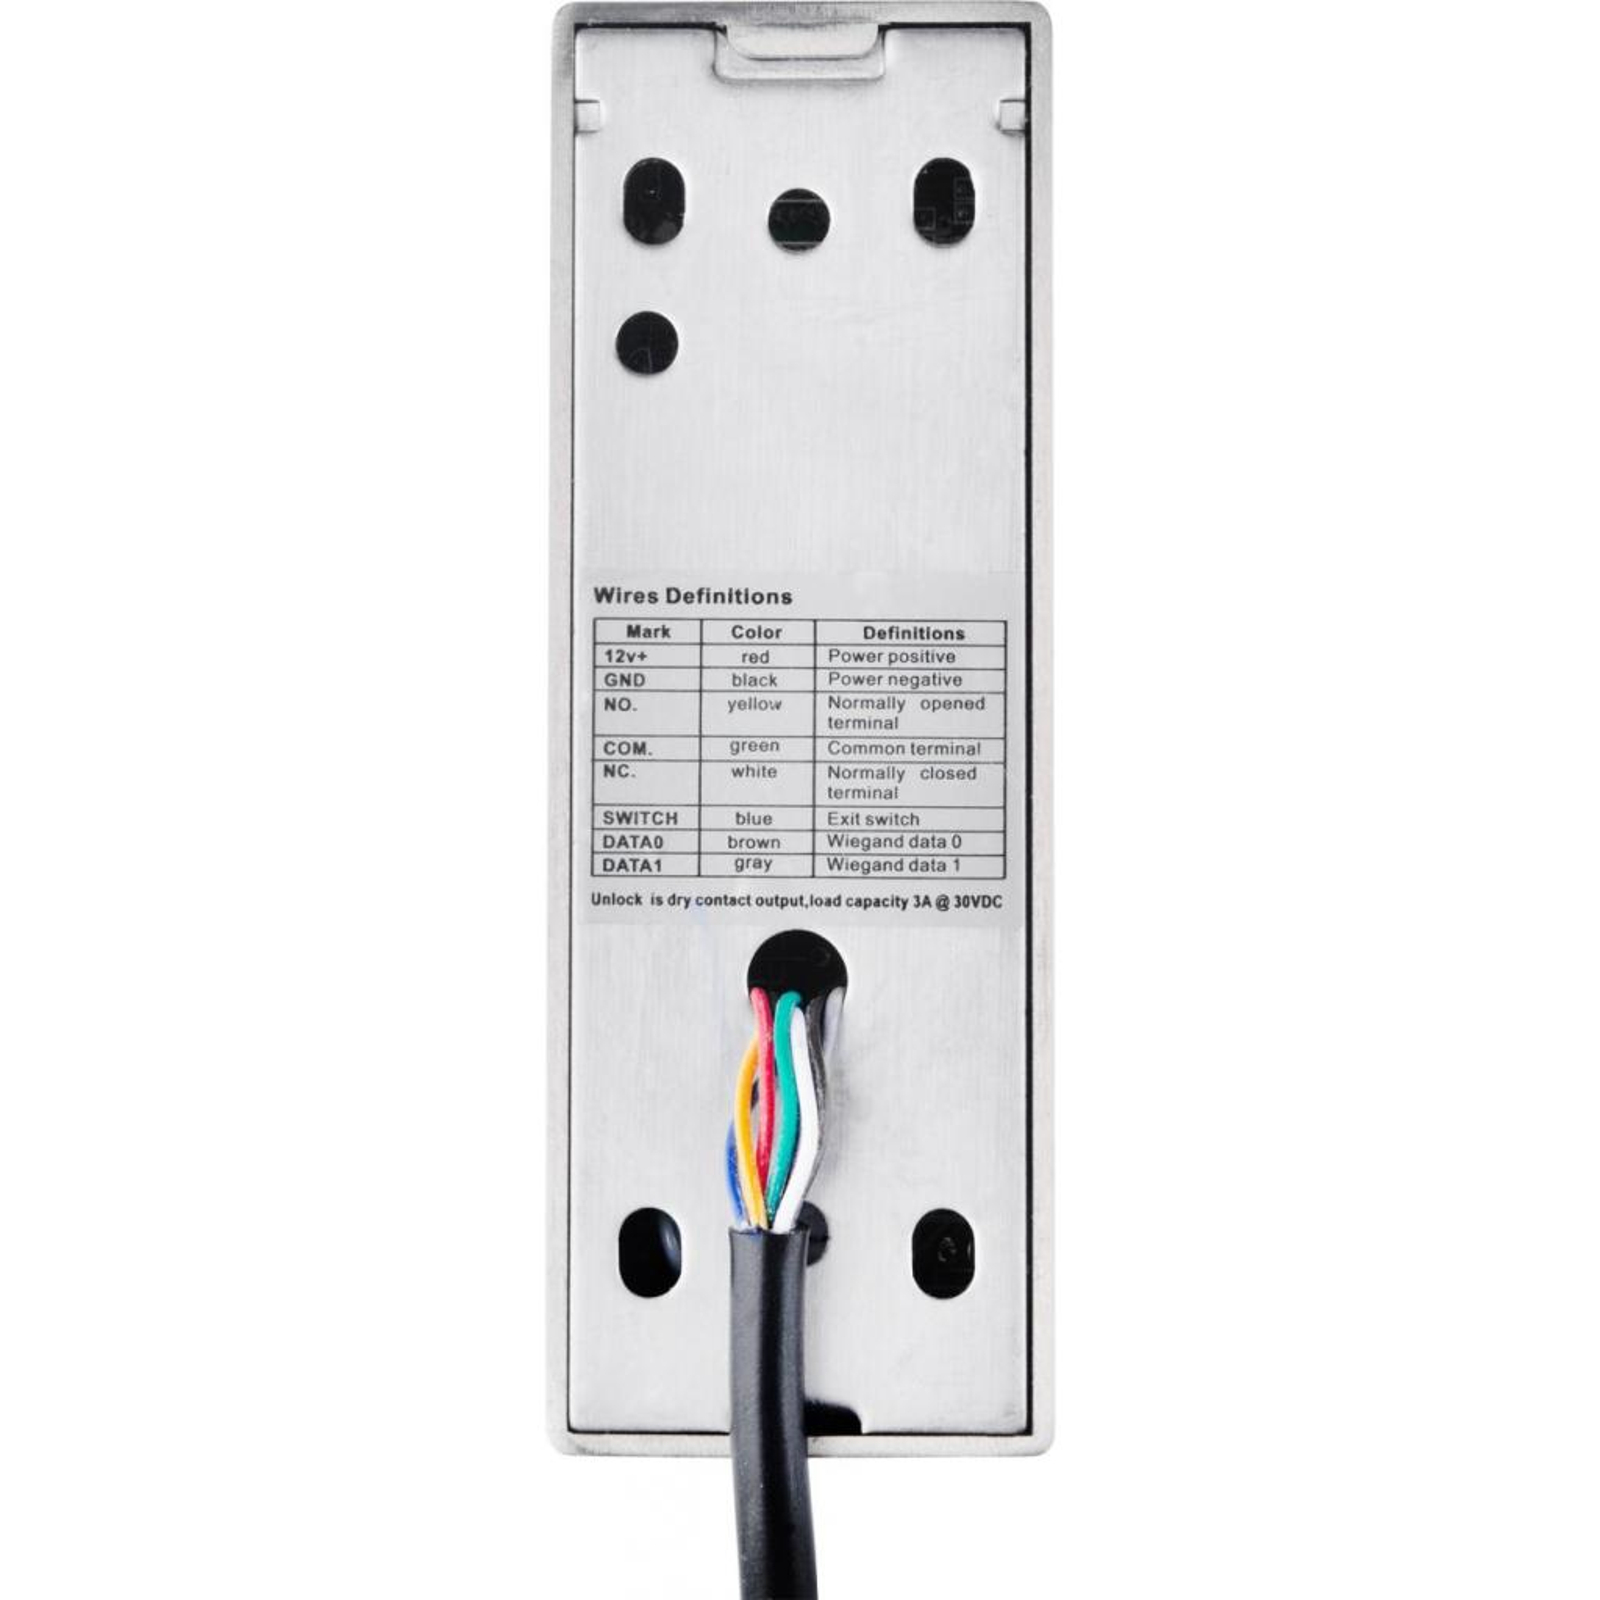 Контроллер доступа Greenvision GV-CEM-002-125 (4176) изображение 2